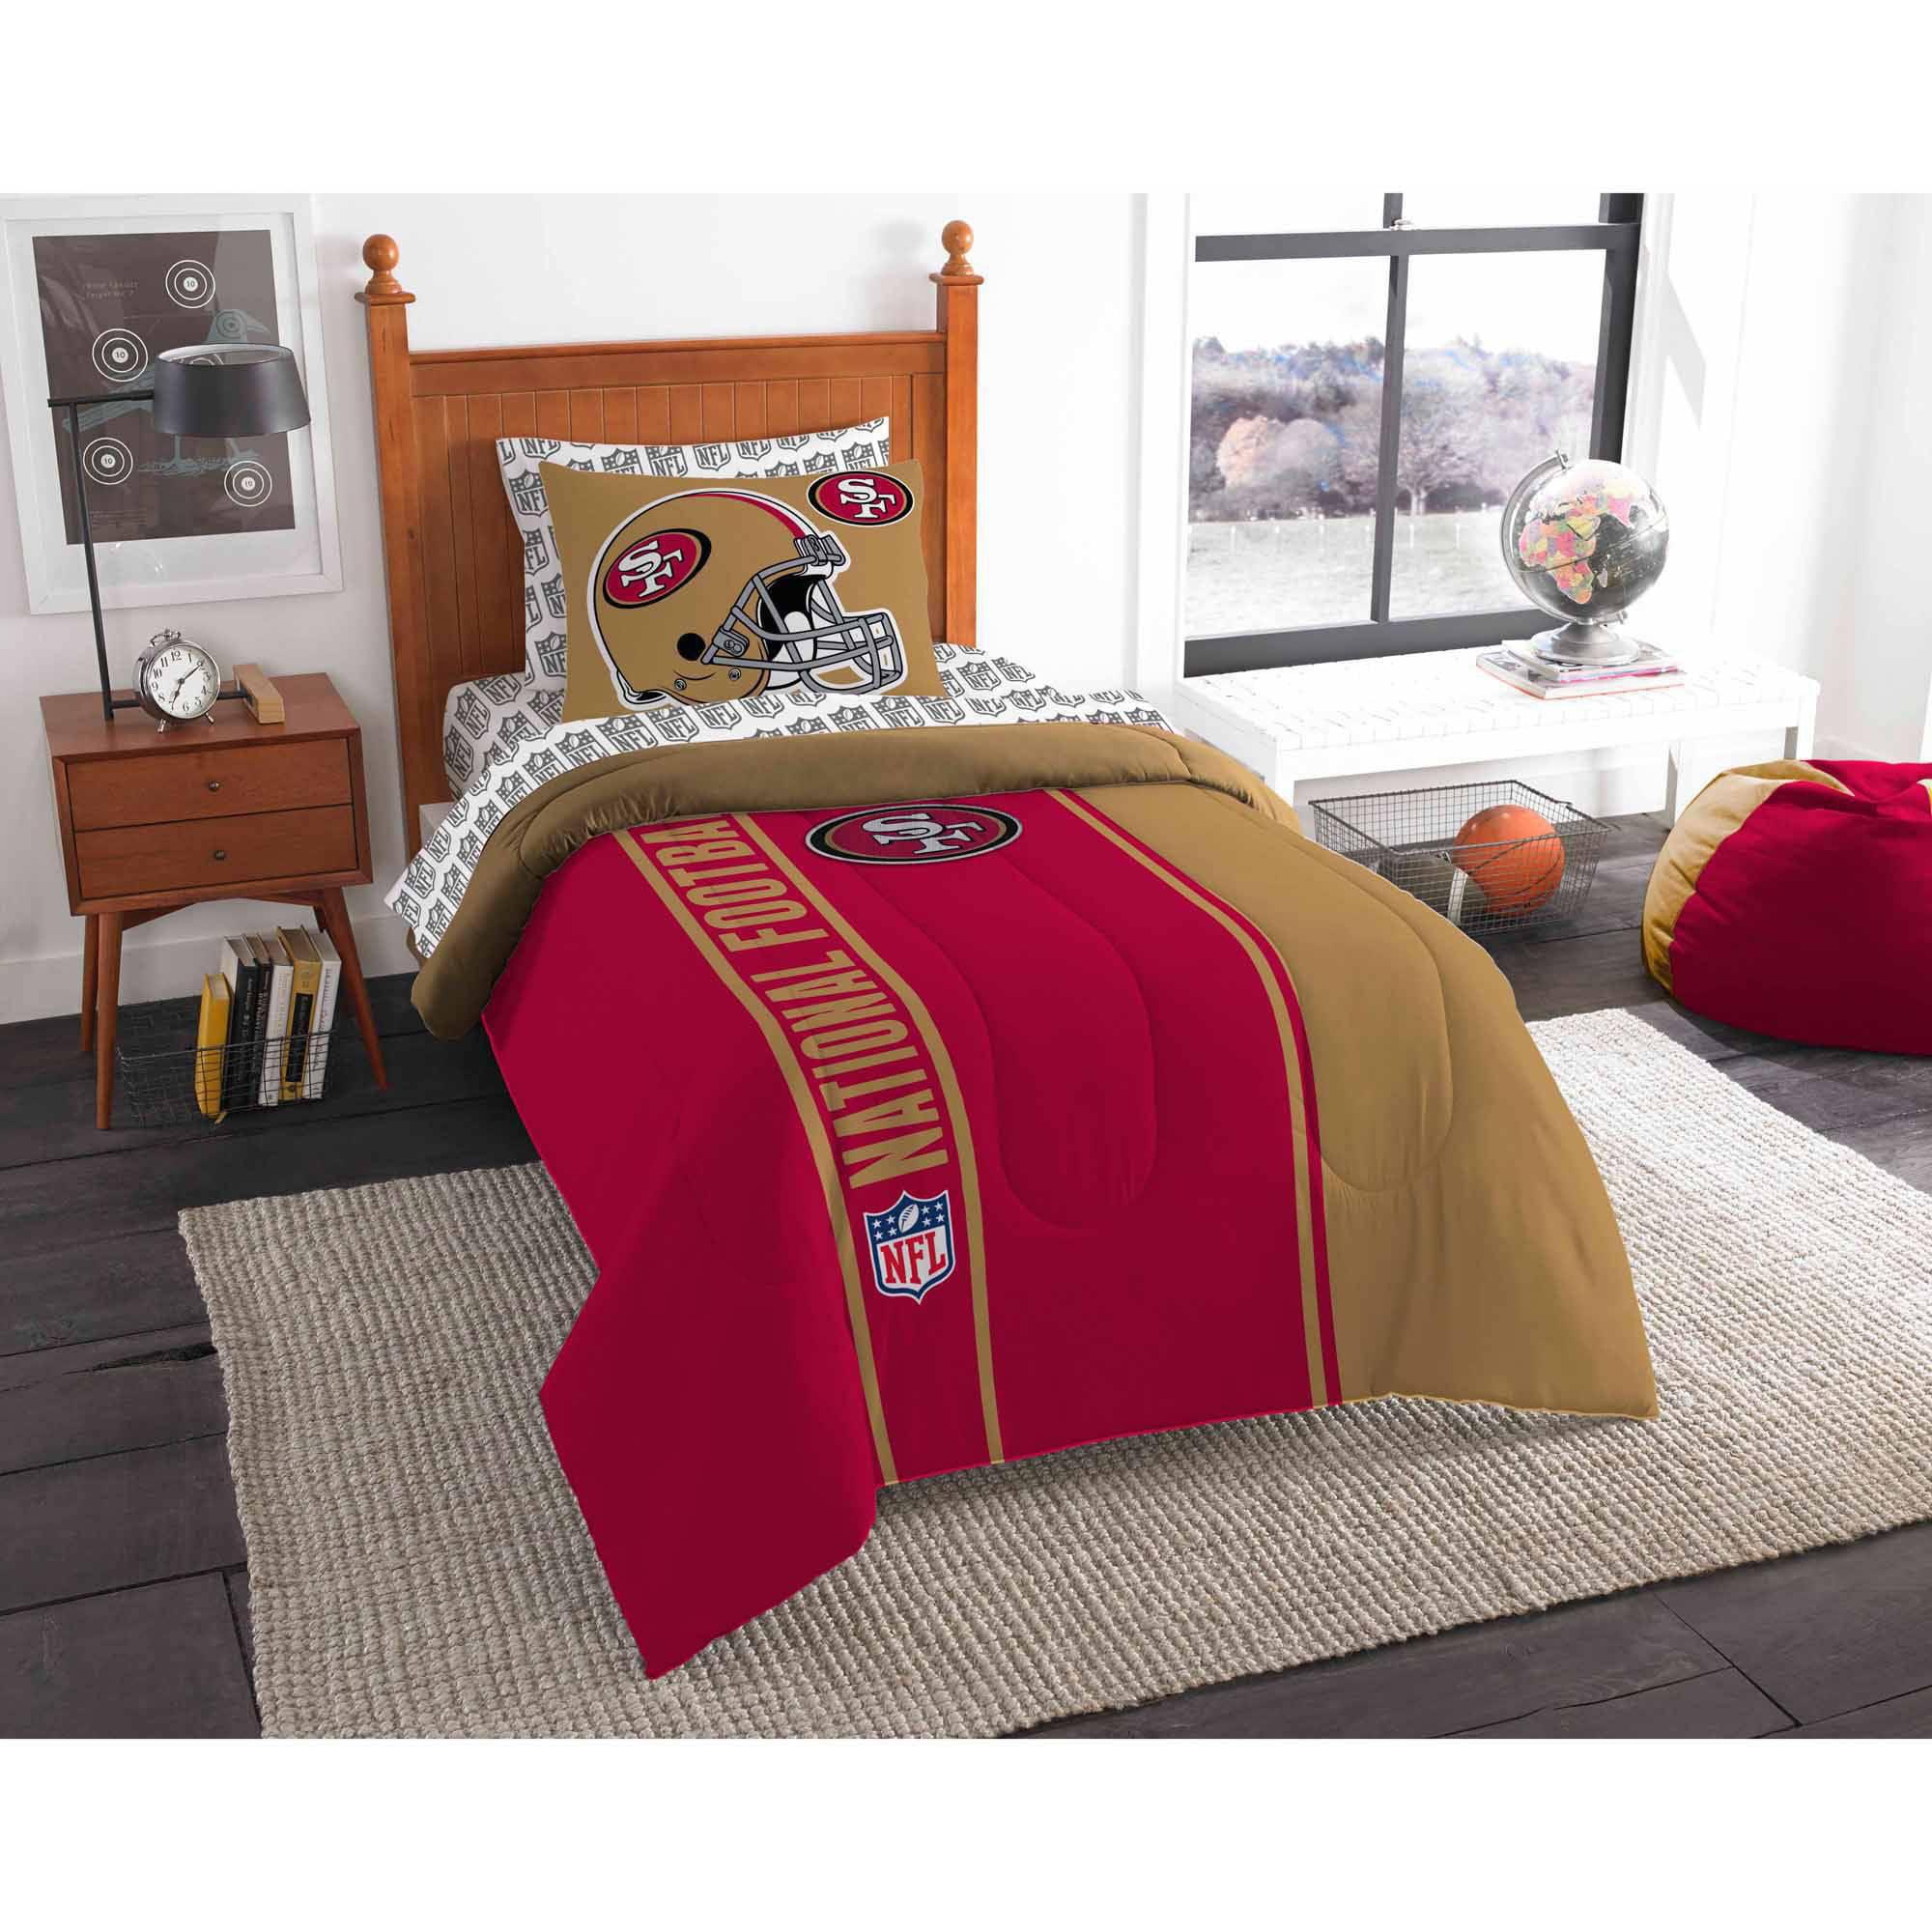 NFL San Francisco 49er's Soft and Cozy Bed in a Bag Complete Bedding Set